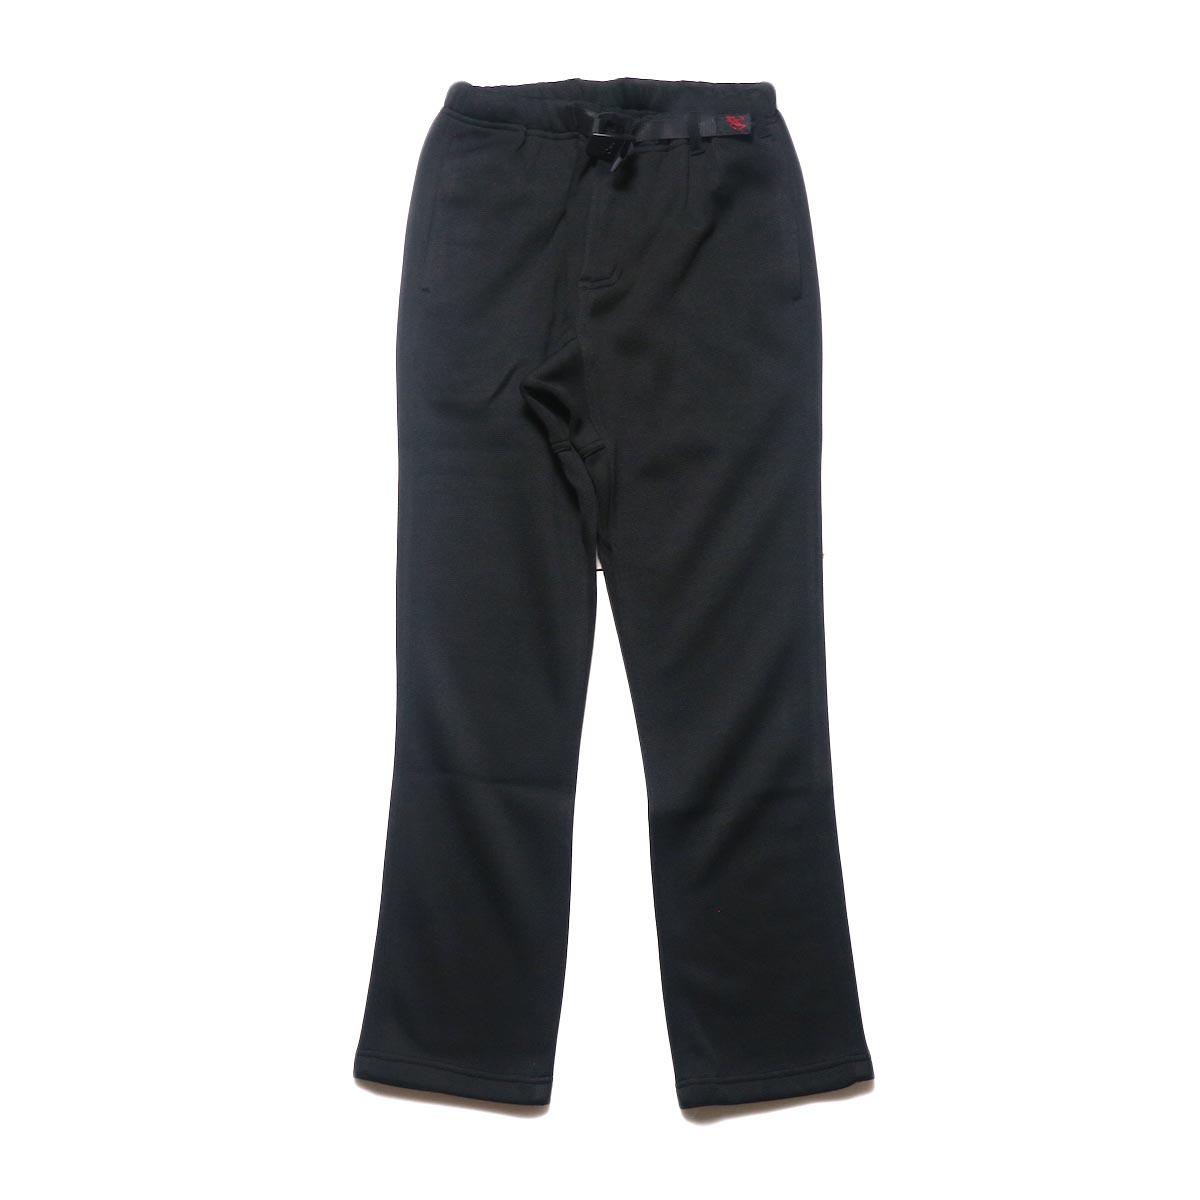 GRAMICCI / BONDING KNIT FLEECE NN-PANTS JUST CUT (Black)